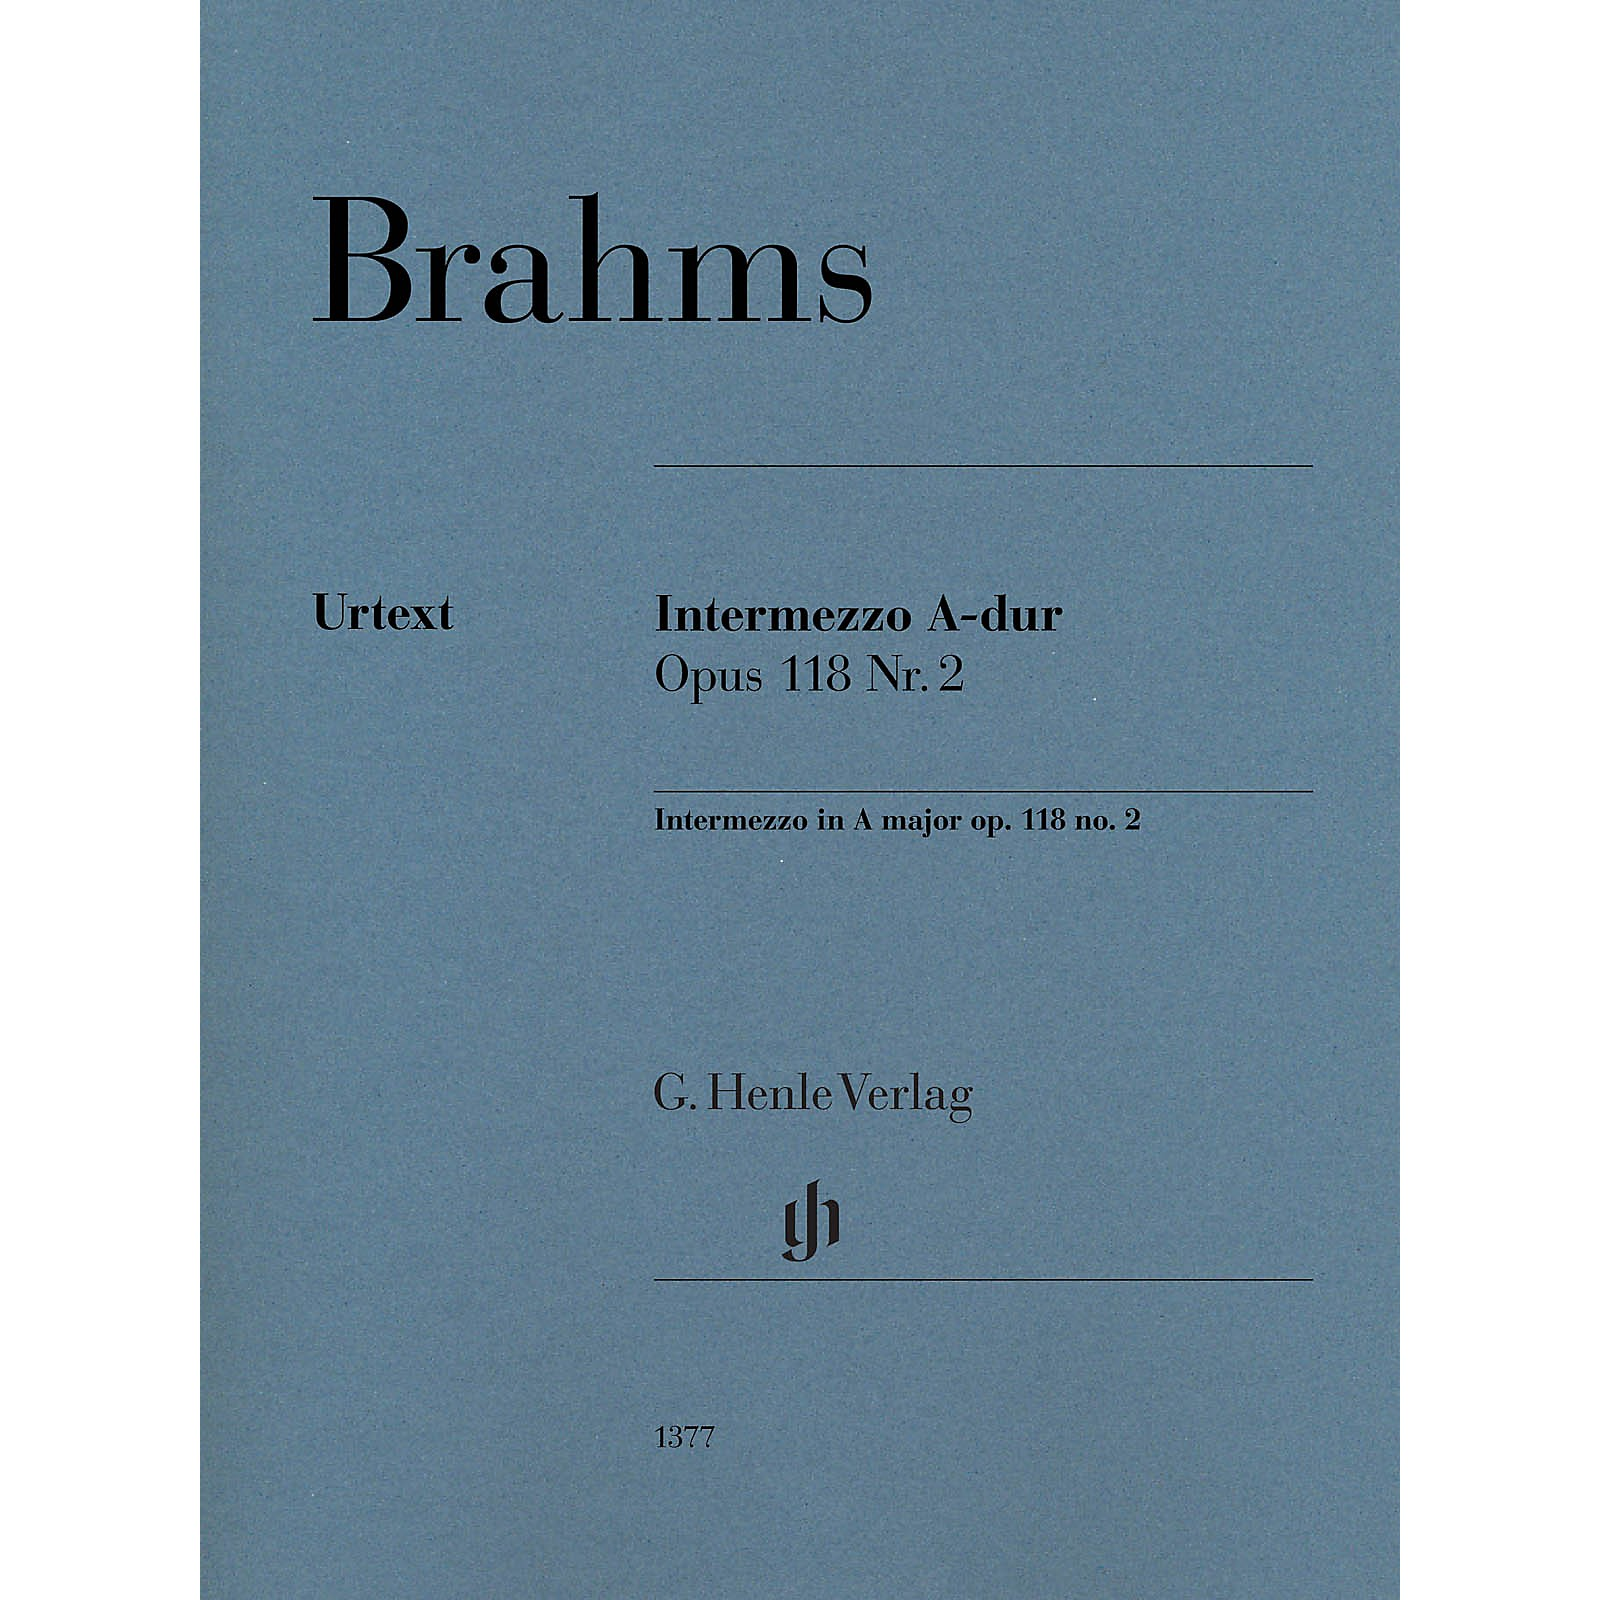 G. Henle Verlag Intermezzo in A Major, Op. 118, No. 2 Piano by Brahms